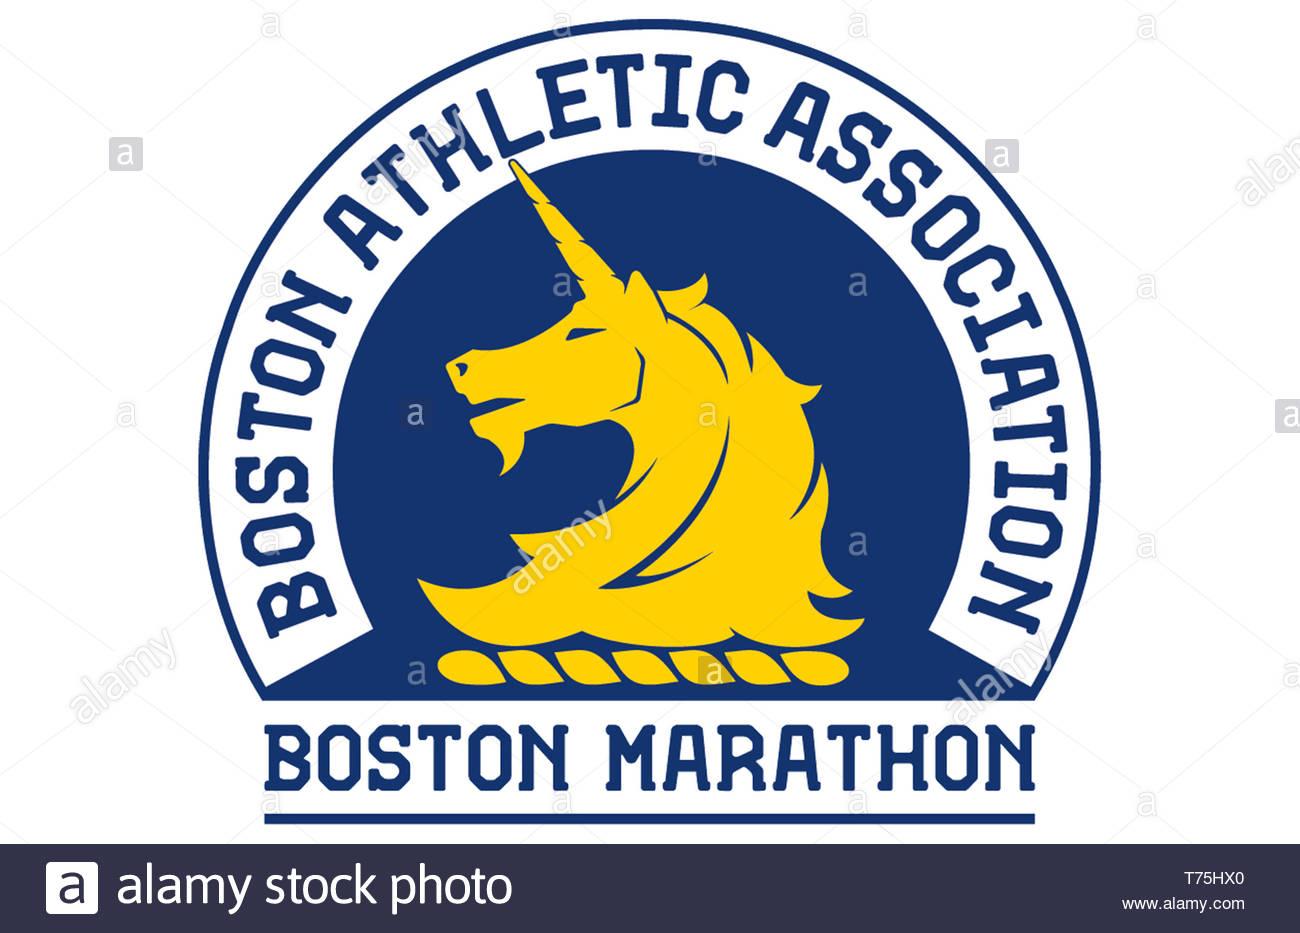 Icono del logotipo de la Maratón de Boston Imagen De Stock